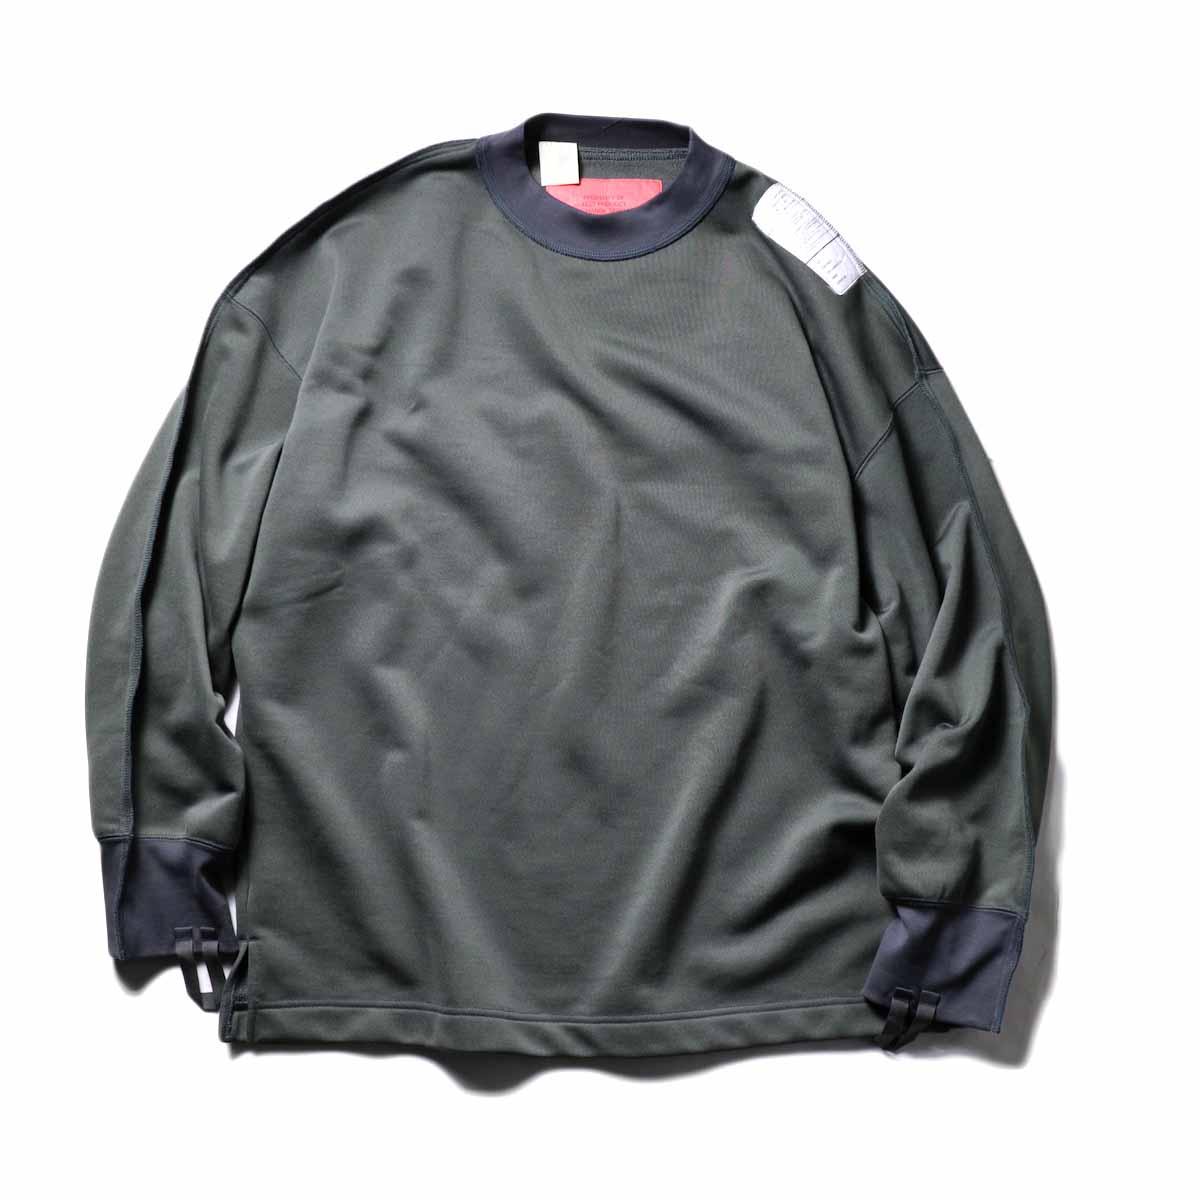 N.HOOLYWOOD / 9211-CS08-024pieces Crew Neck Sweat Shirt (Gray)